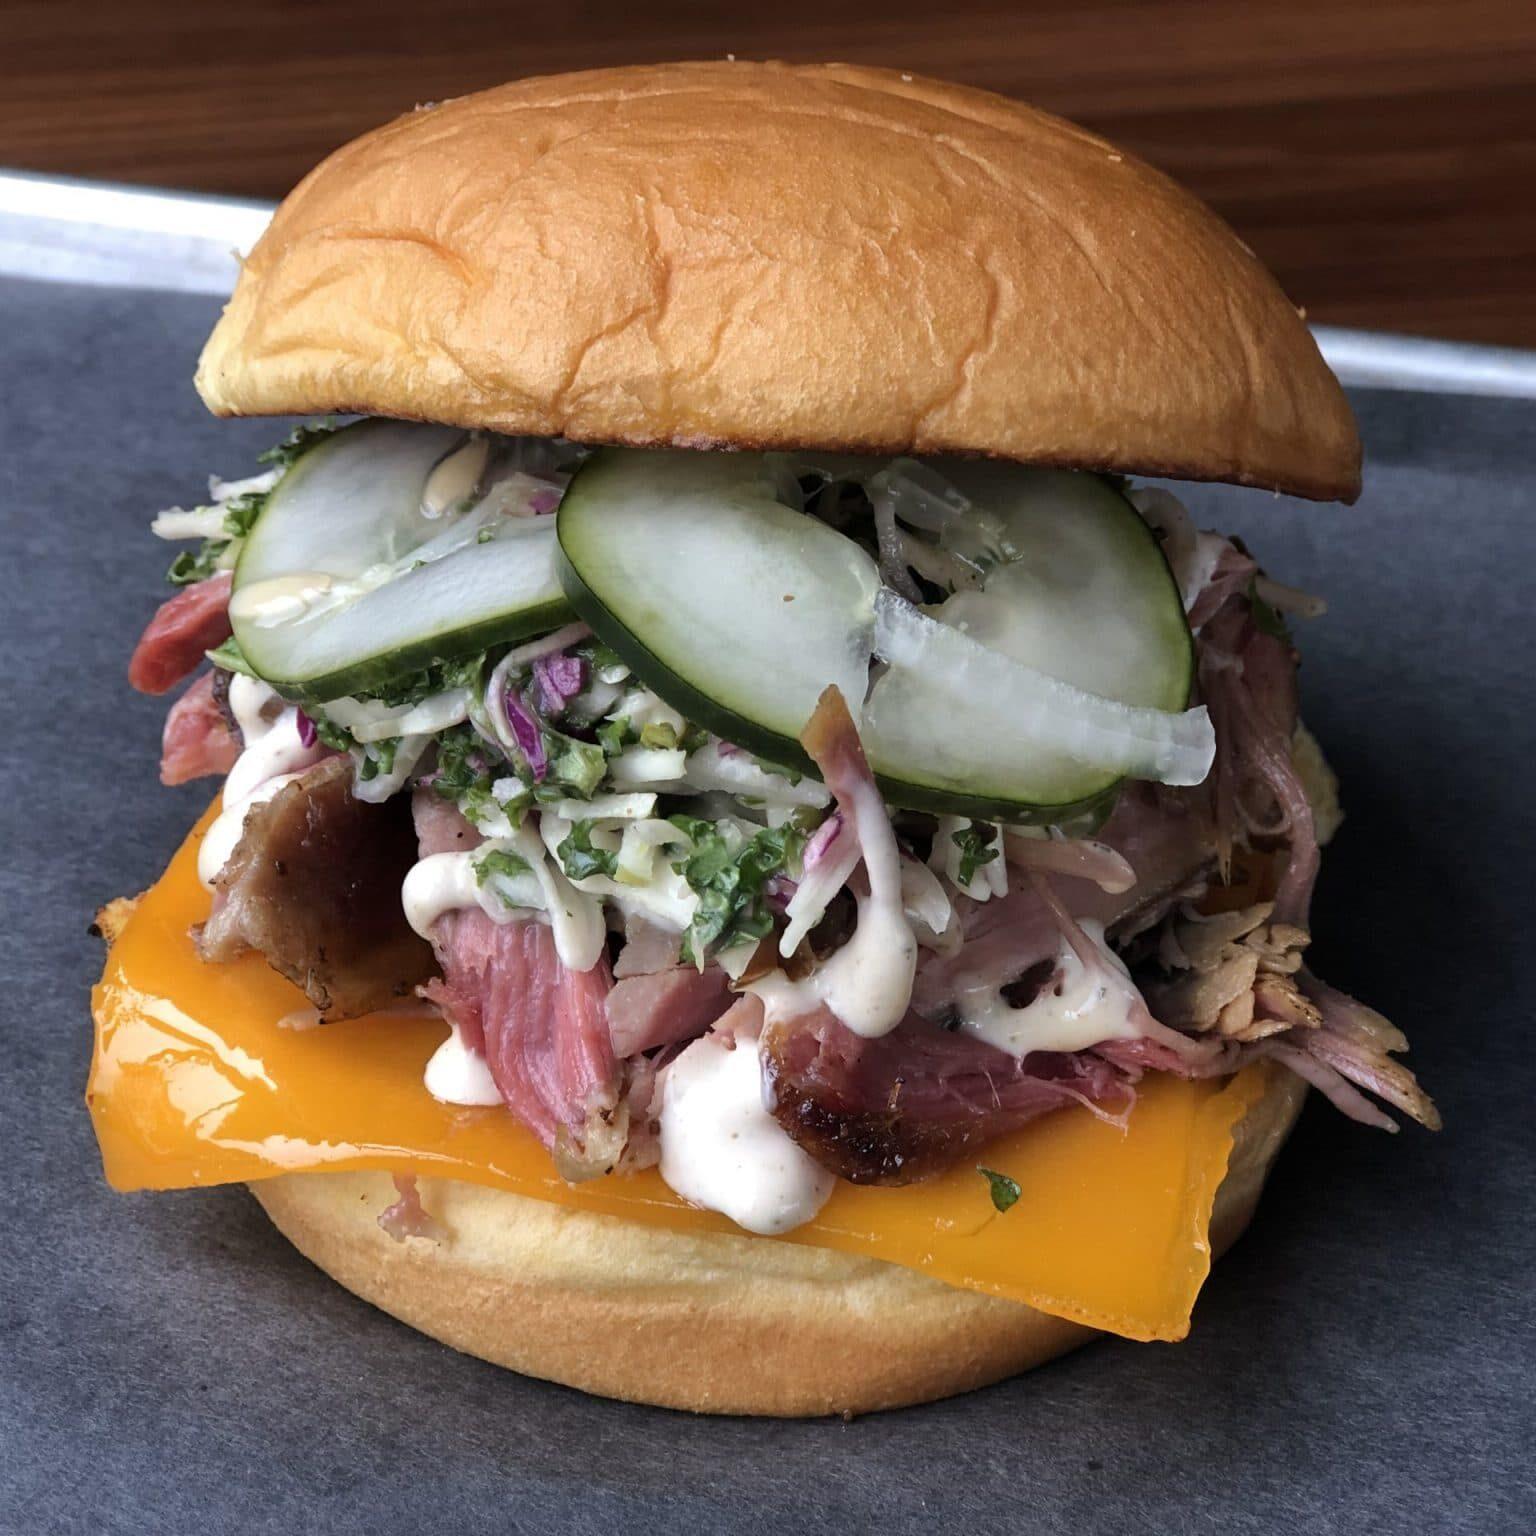 The Hogwood Sandwich